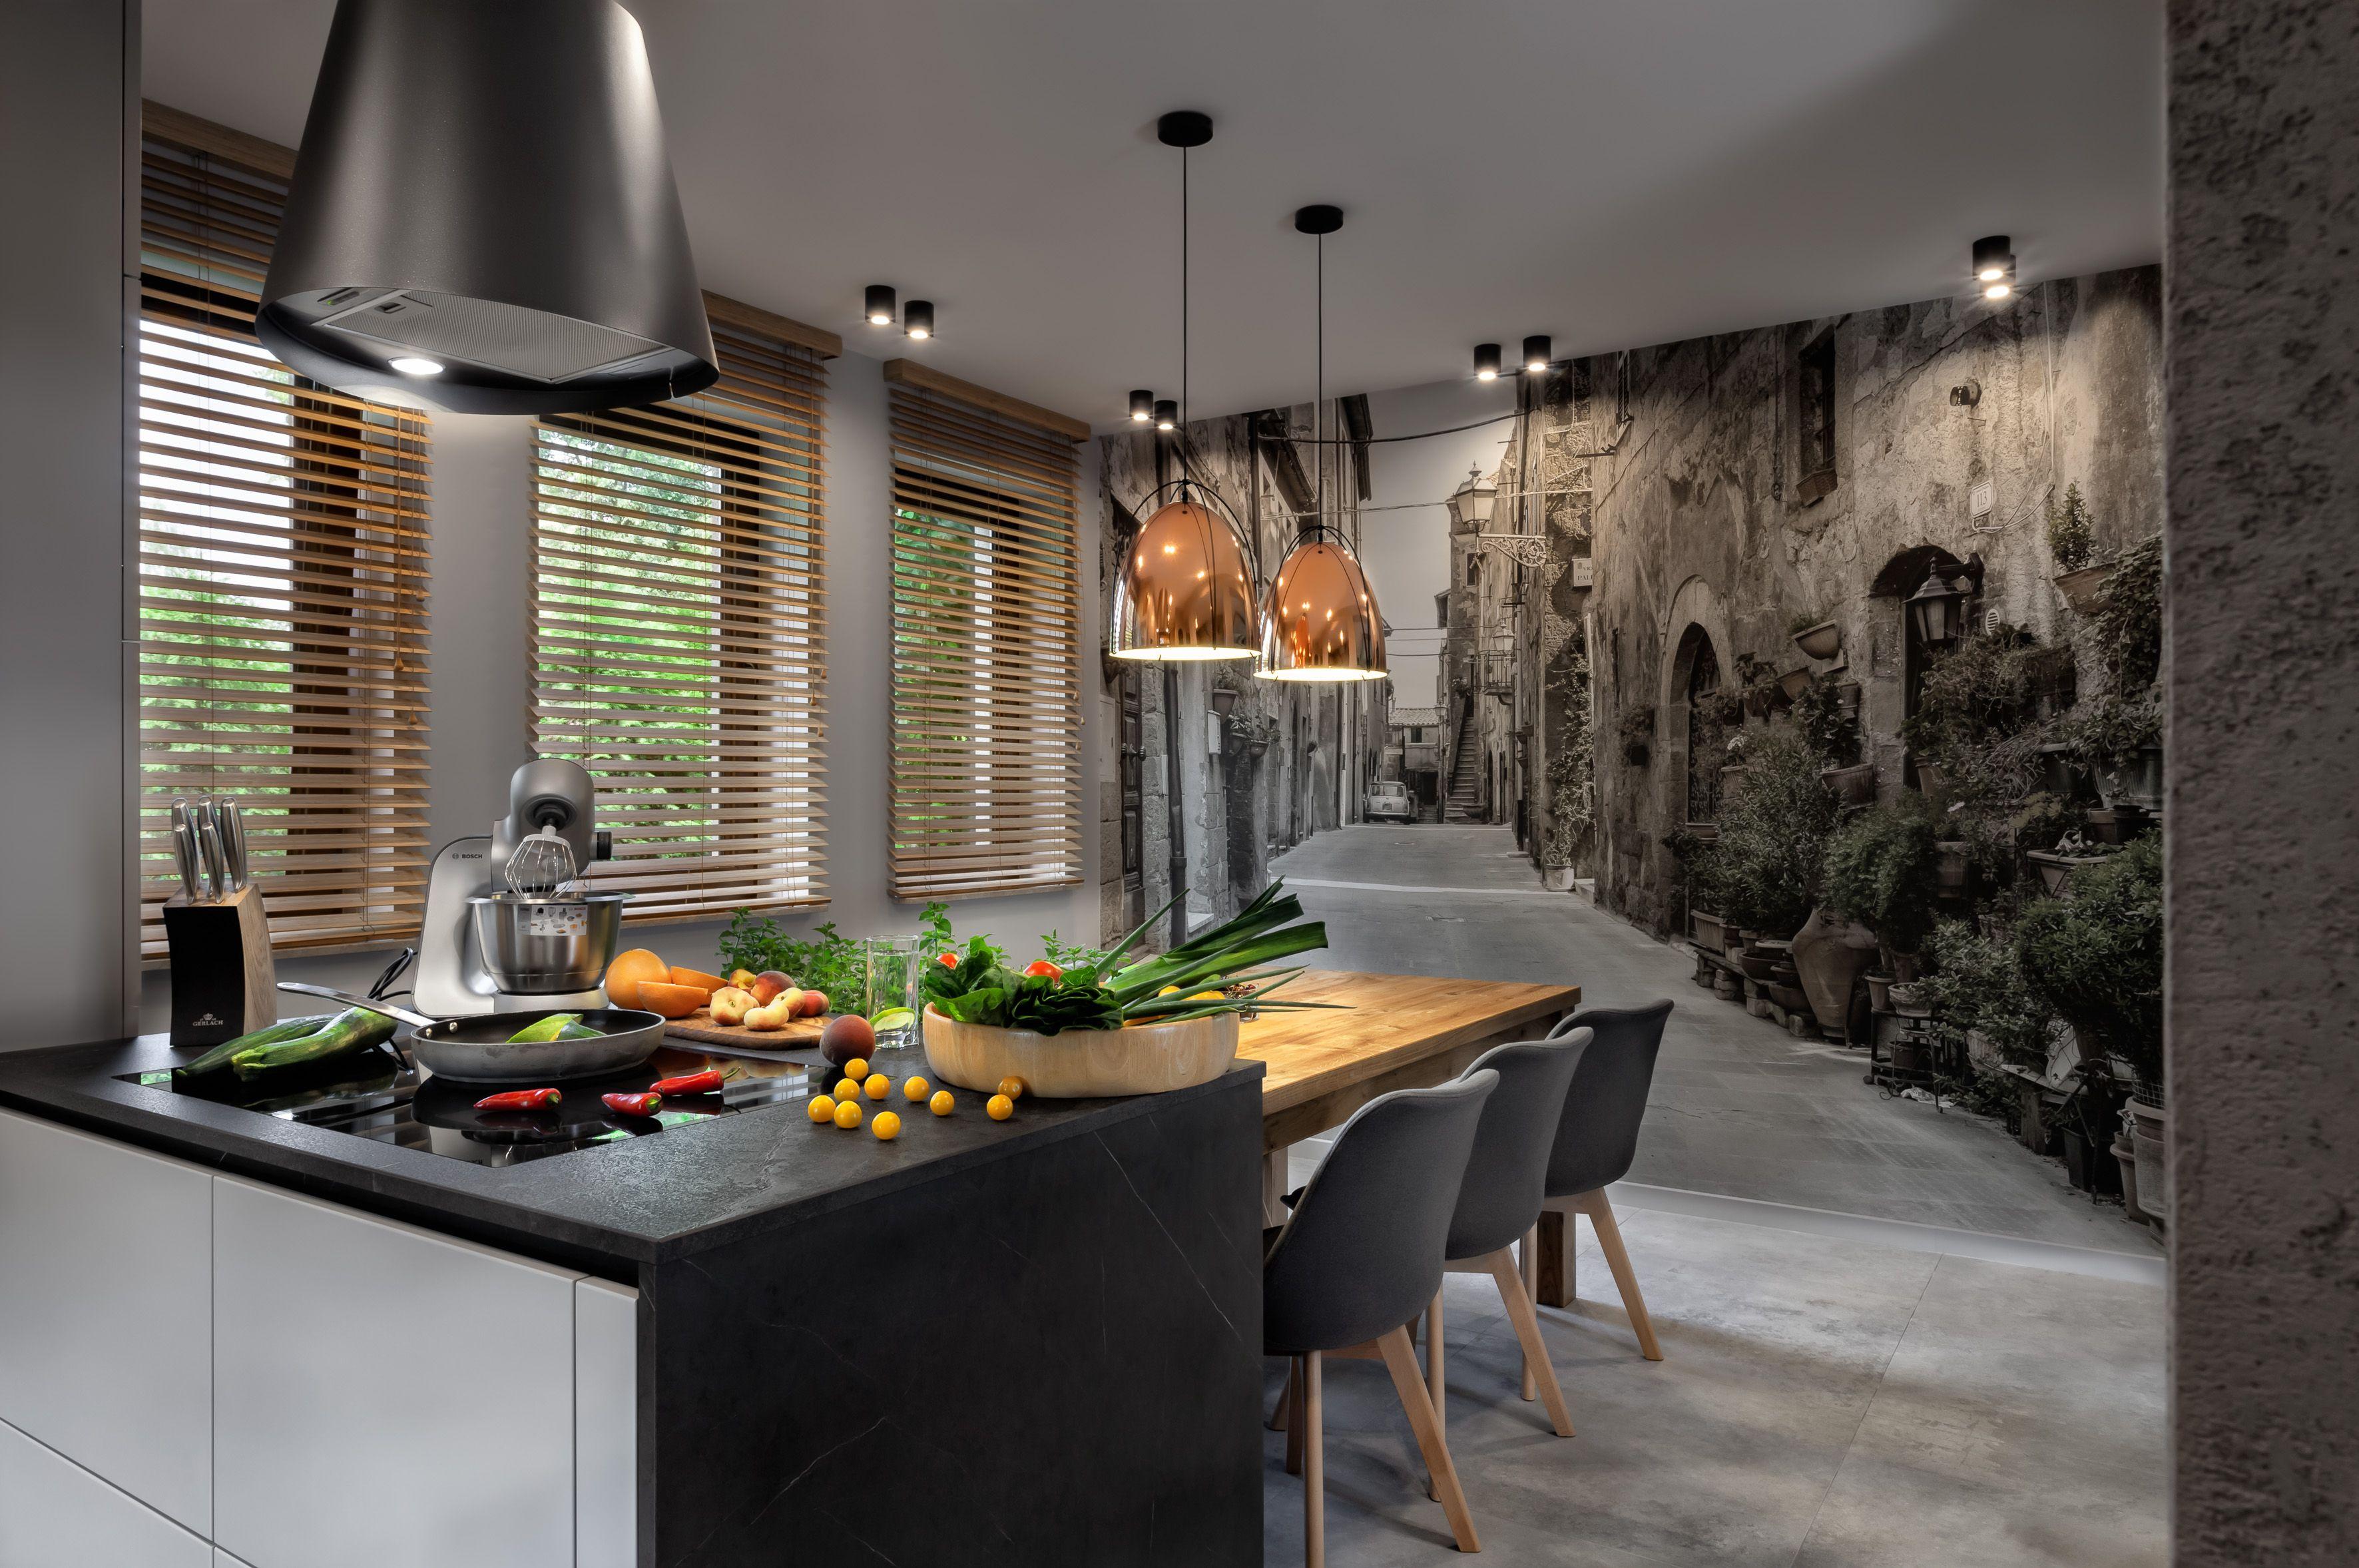 Kuchnia Z Widokiem 03 Kitchen Breakfast Bar Home Decor